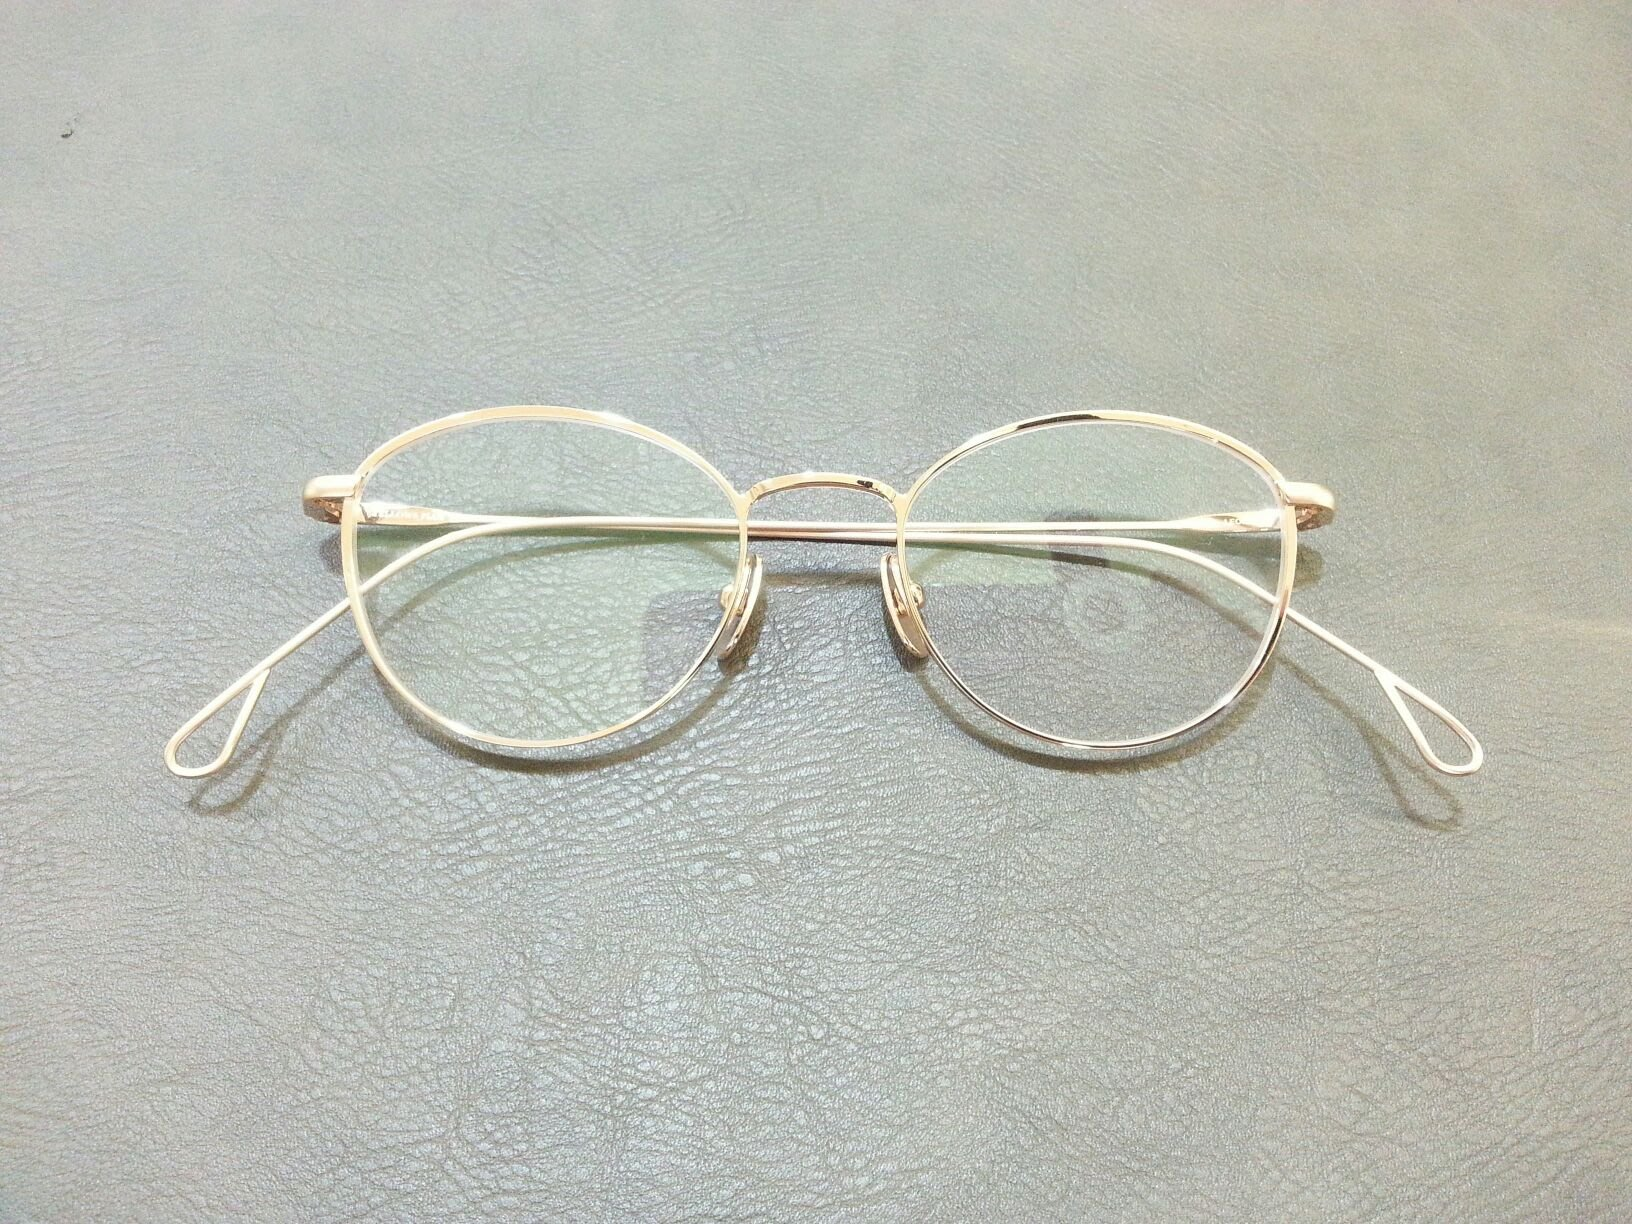 YELLOWS PLUS LEONA 純鈦金屬 日本手工眼鏡  玫瑰金色